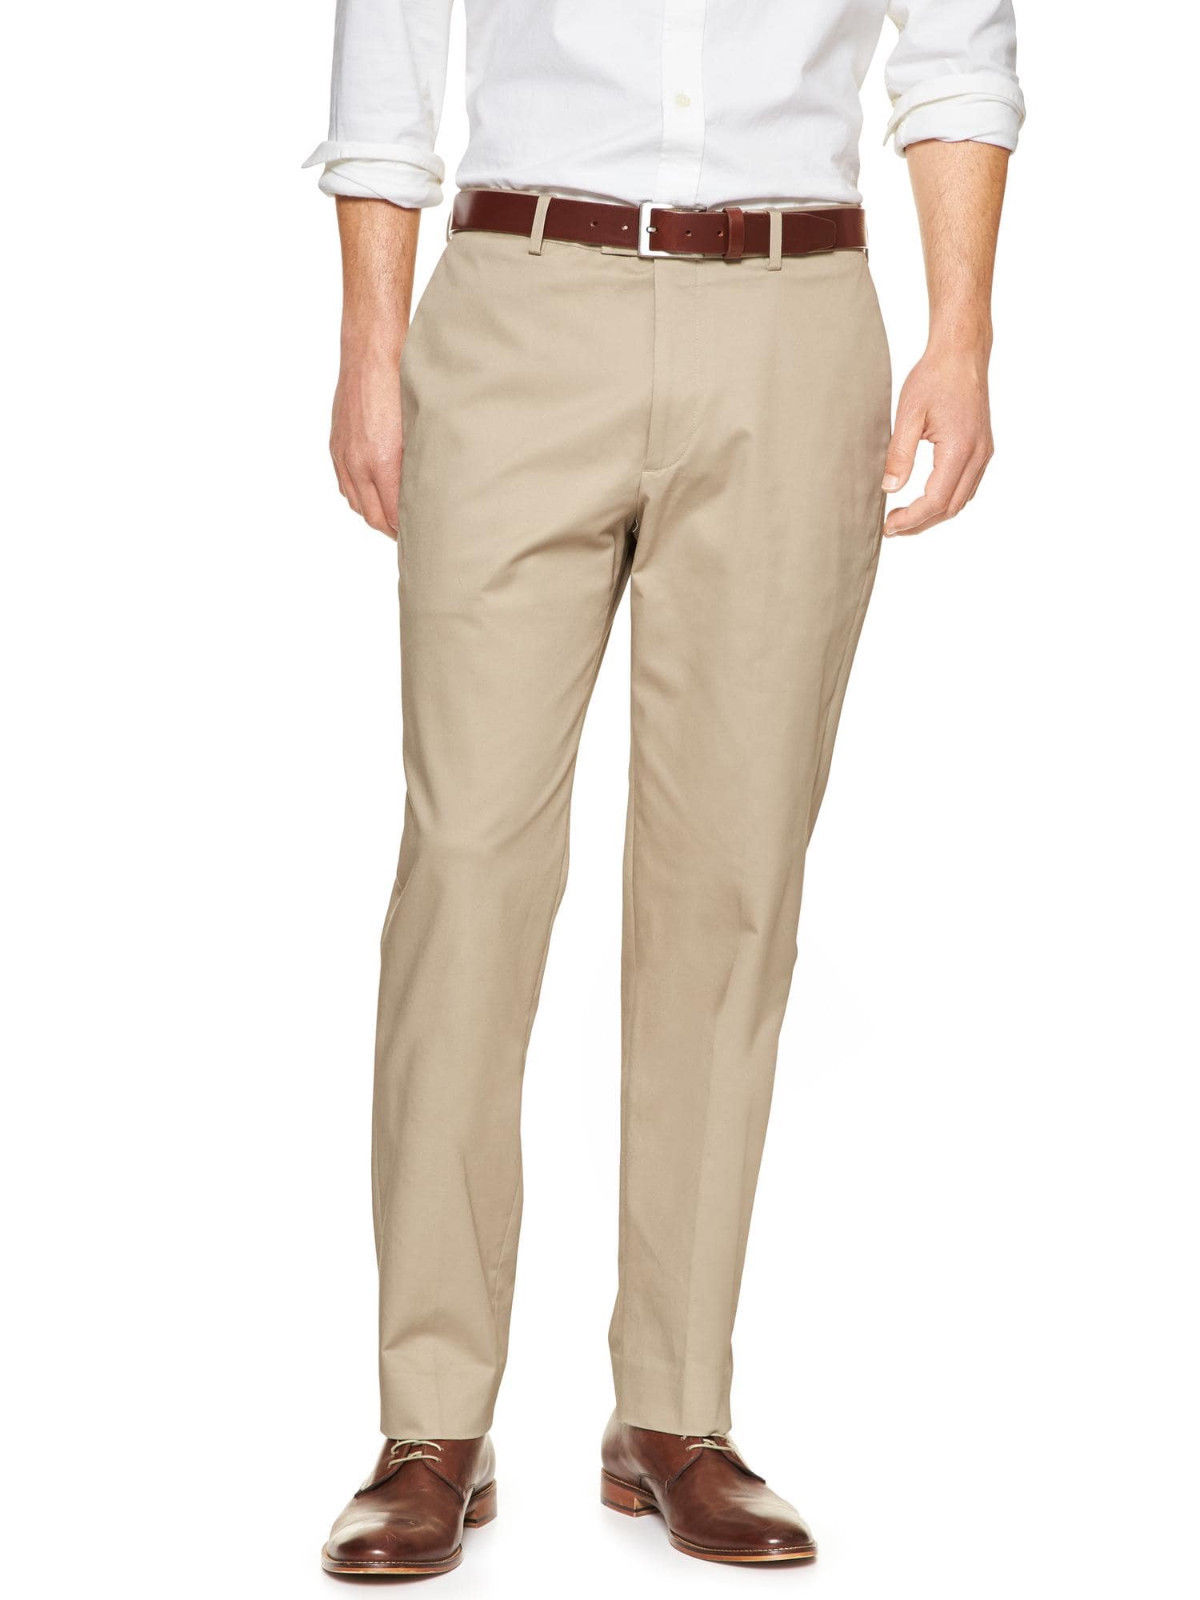 Banana Republic Mens Non Iron Slim Fit Dress Pants Khaki Beige 36W x 34L